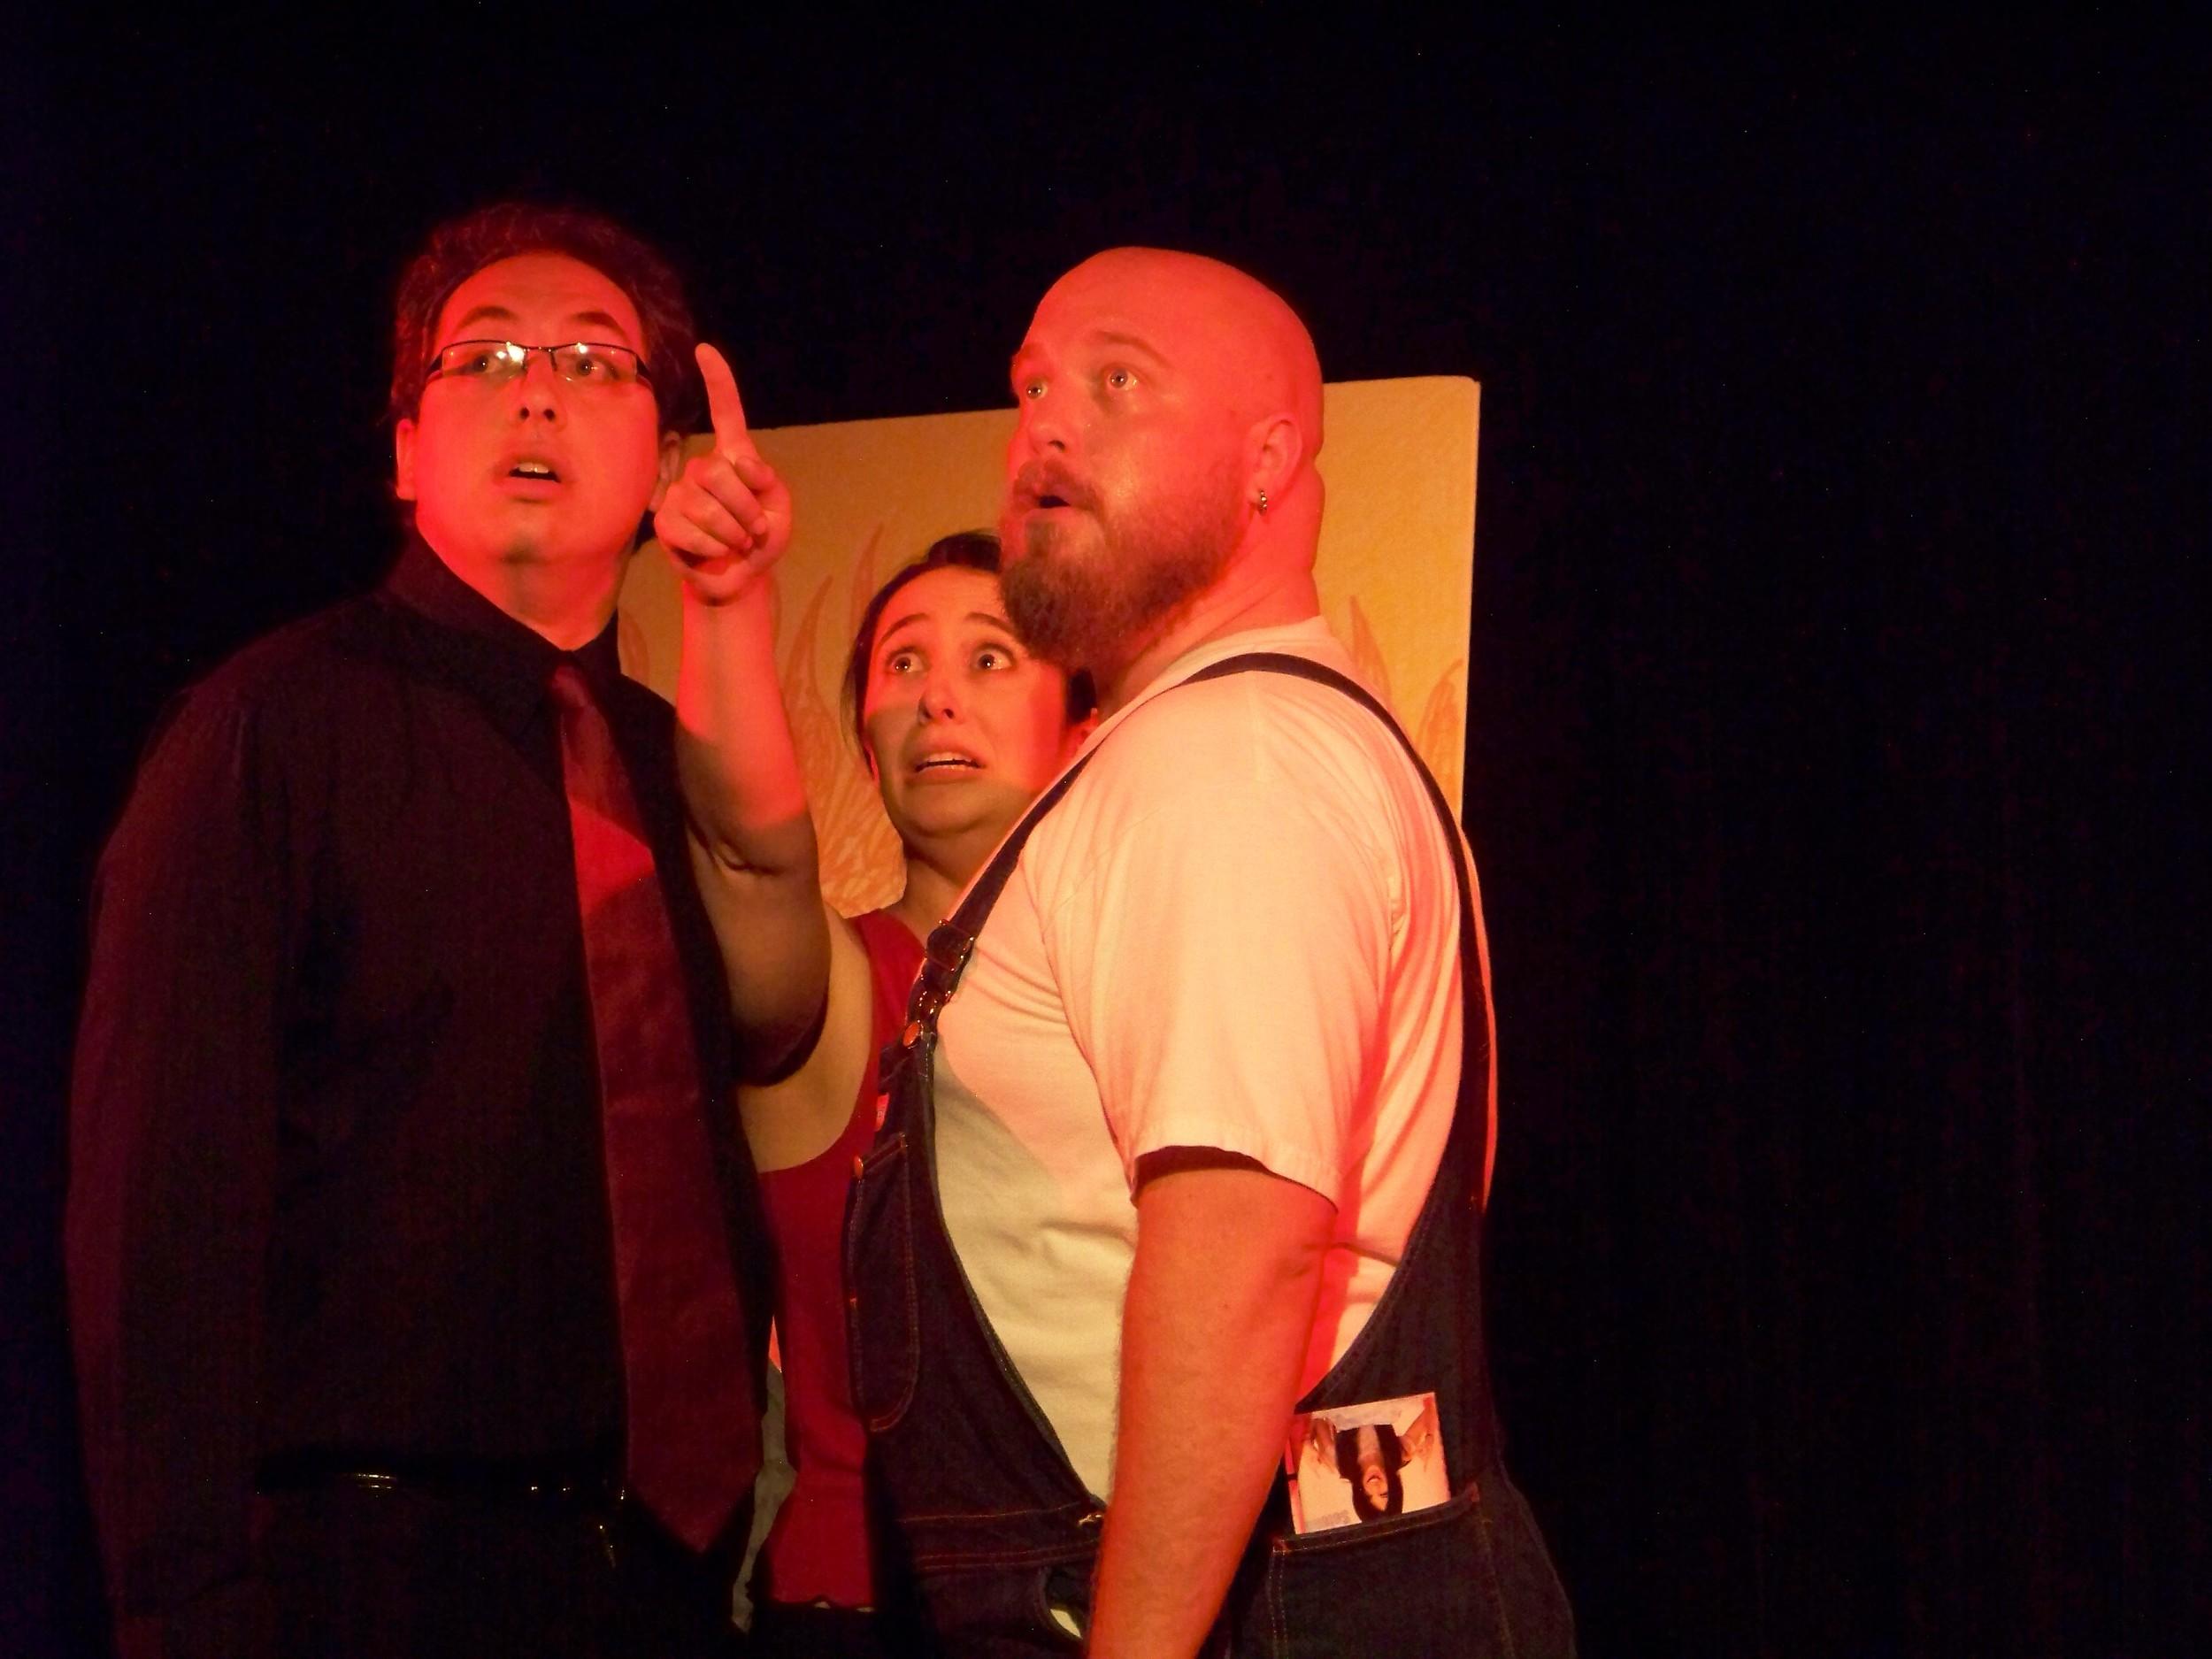 Steven Bucko, Meg DiSciorio and Jason Vogen